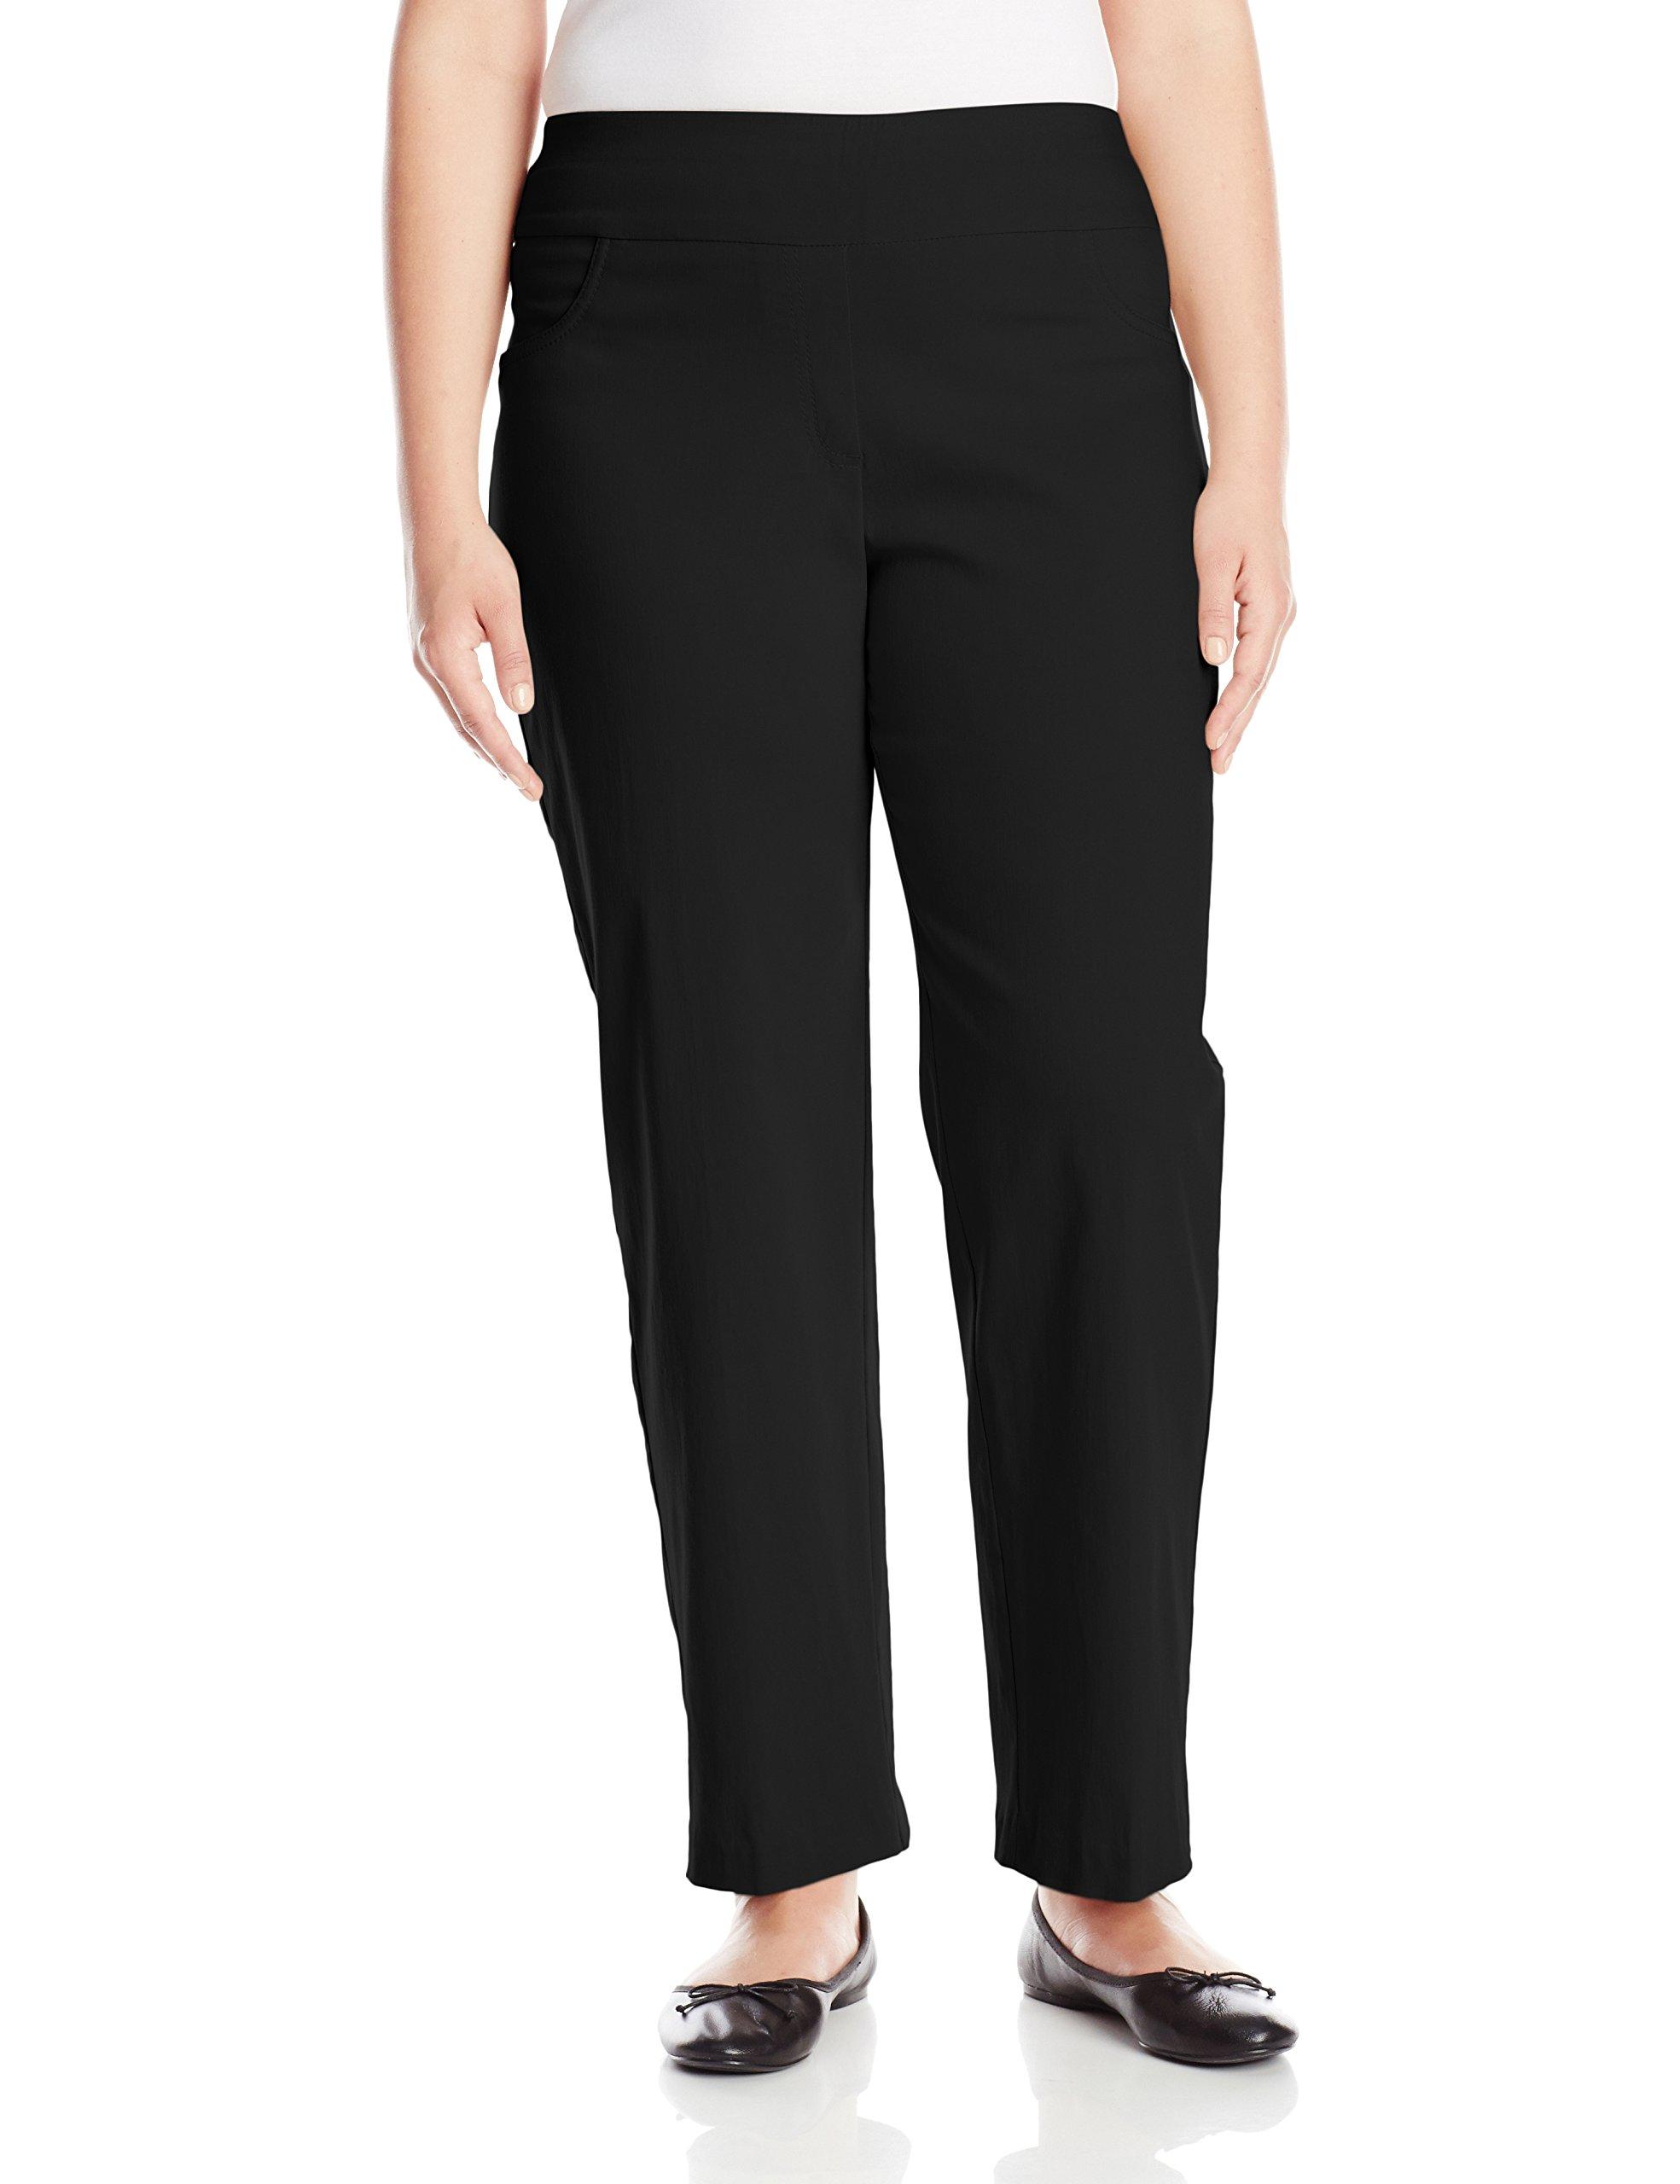 Ruby Rd. Women's Plus-Size Plus Pull-On Solar Millennium Super Stretch Pant, Black, 18W by Ruby Rd.